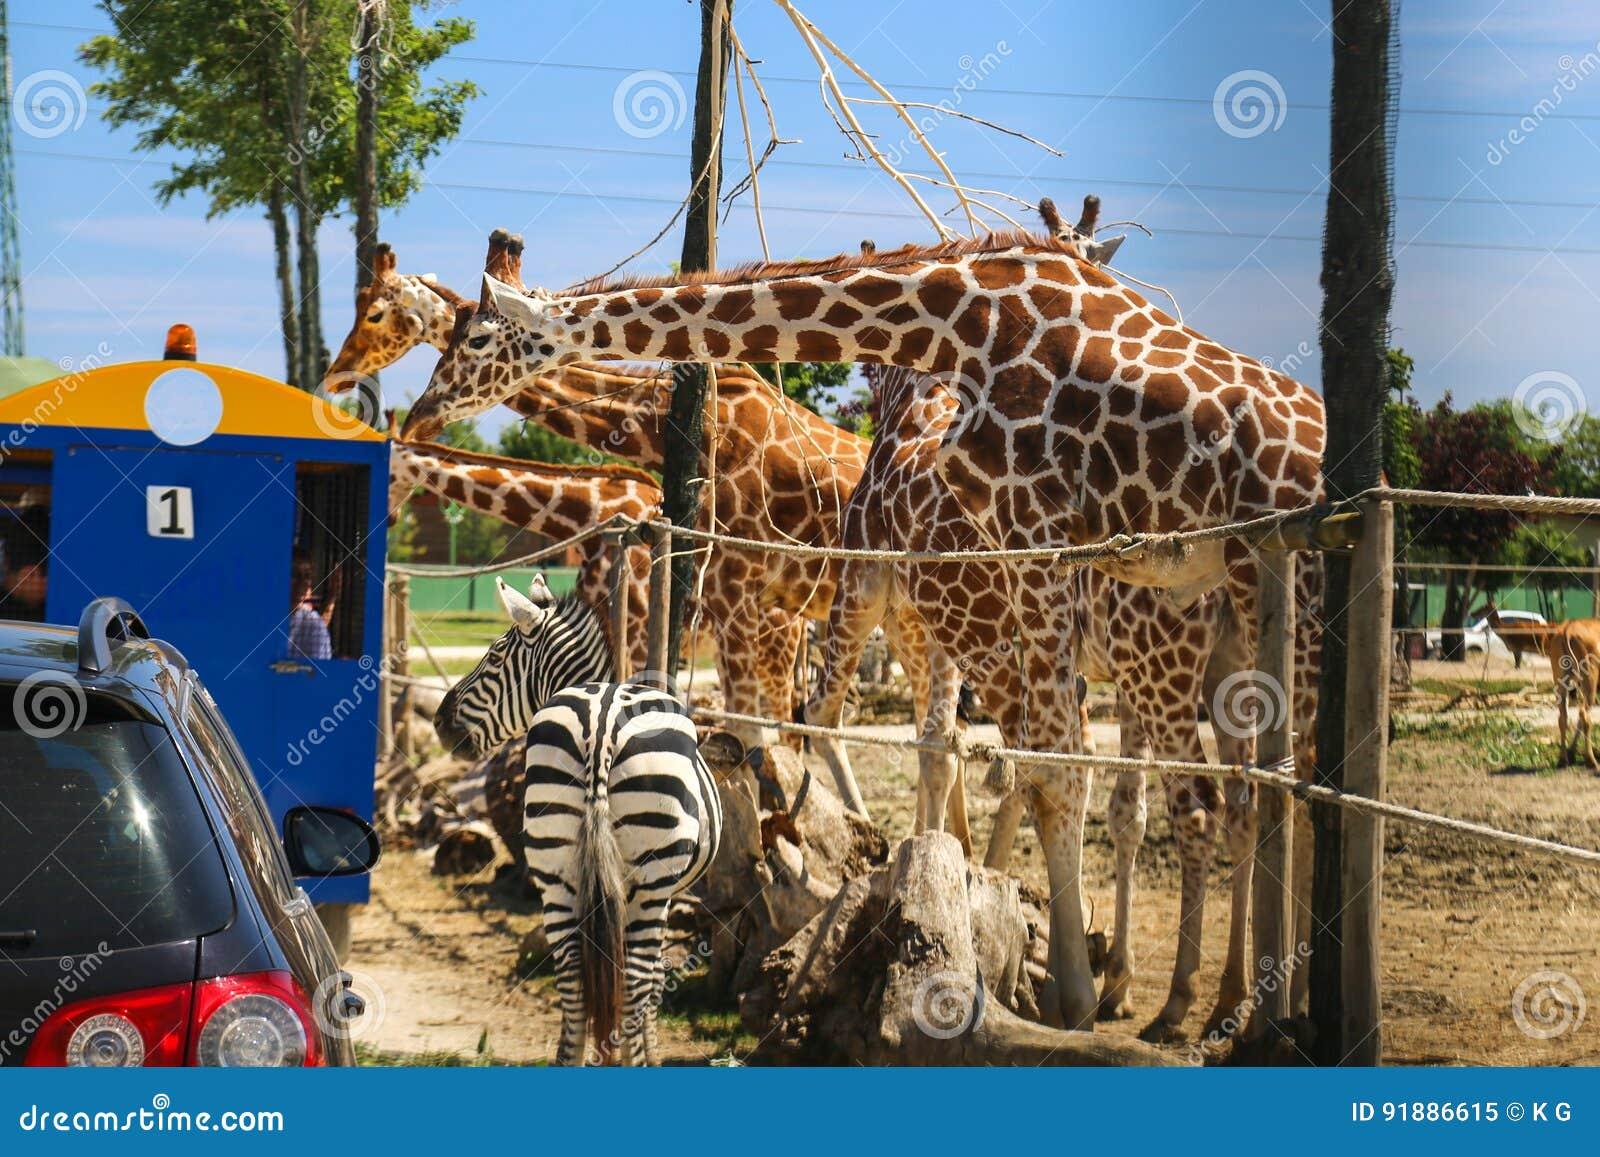 Safari Royalty-Free Stock Photography